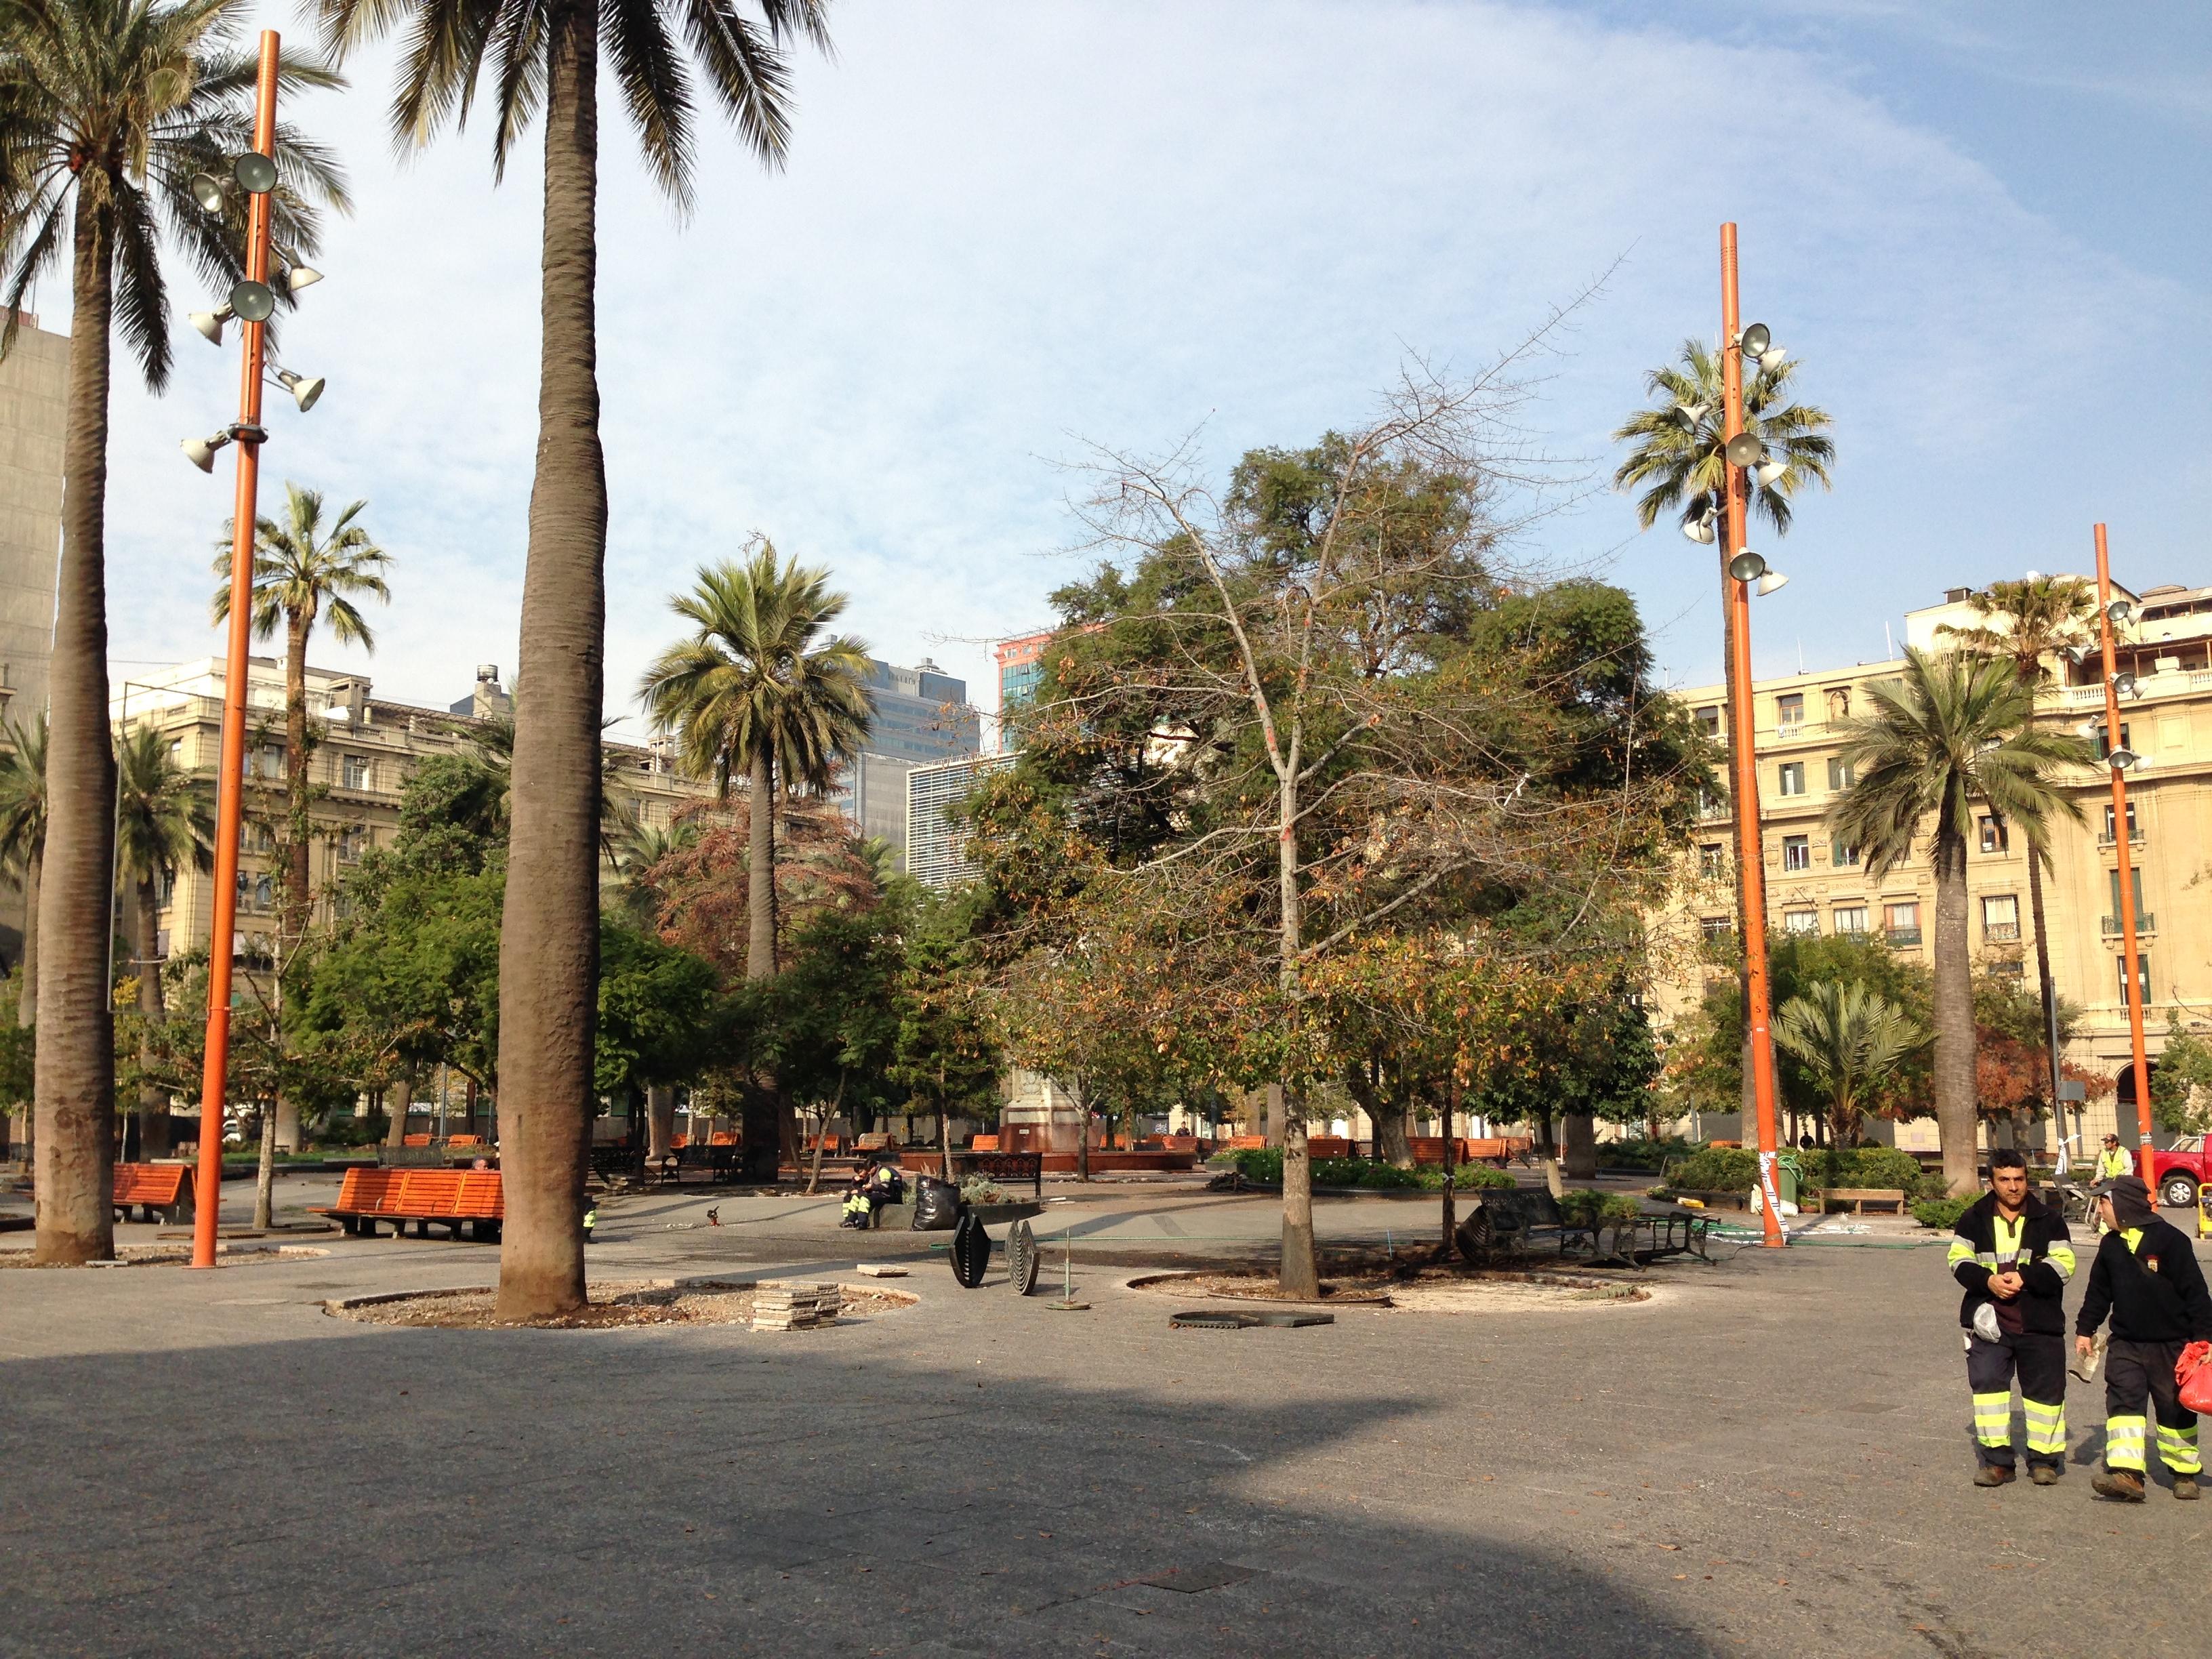 Plaza de Armas (considerado como centro histórico de Santiago)